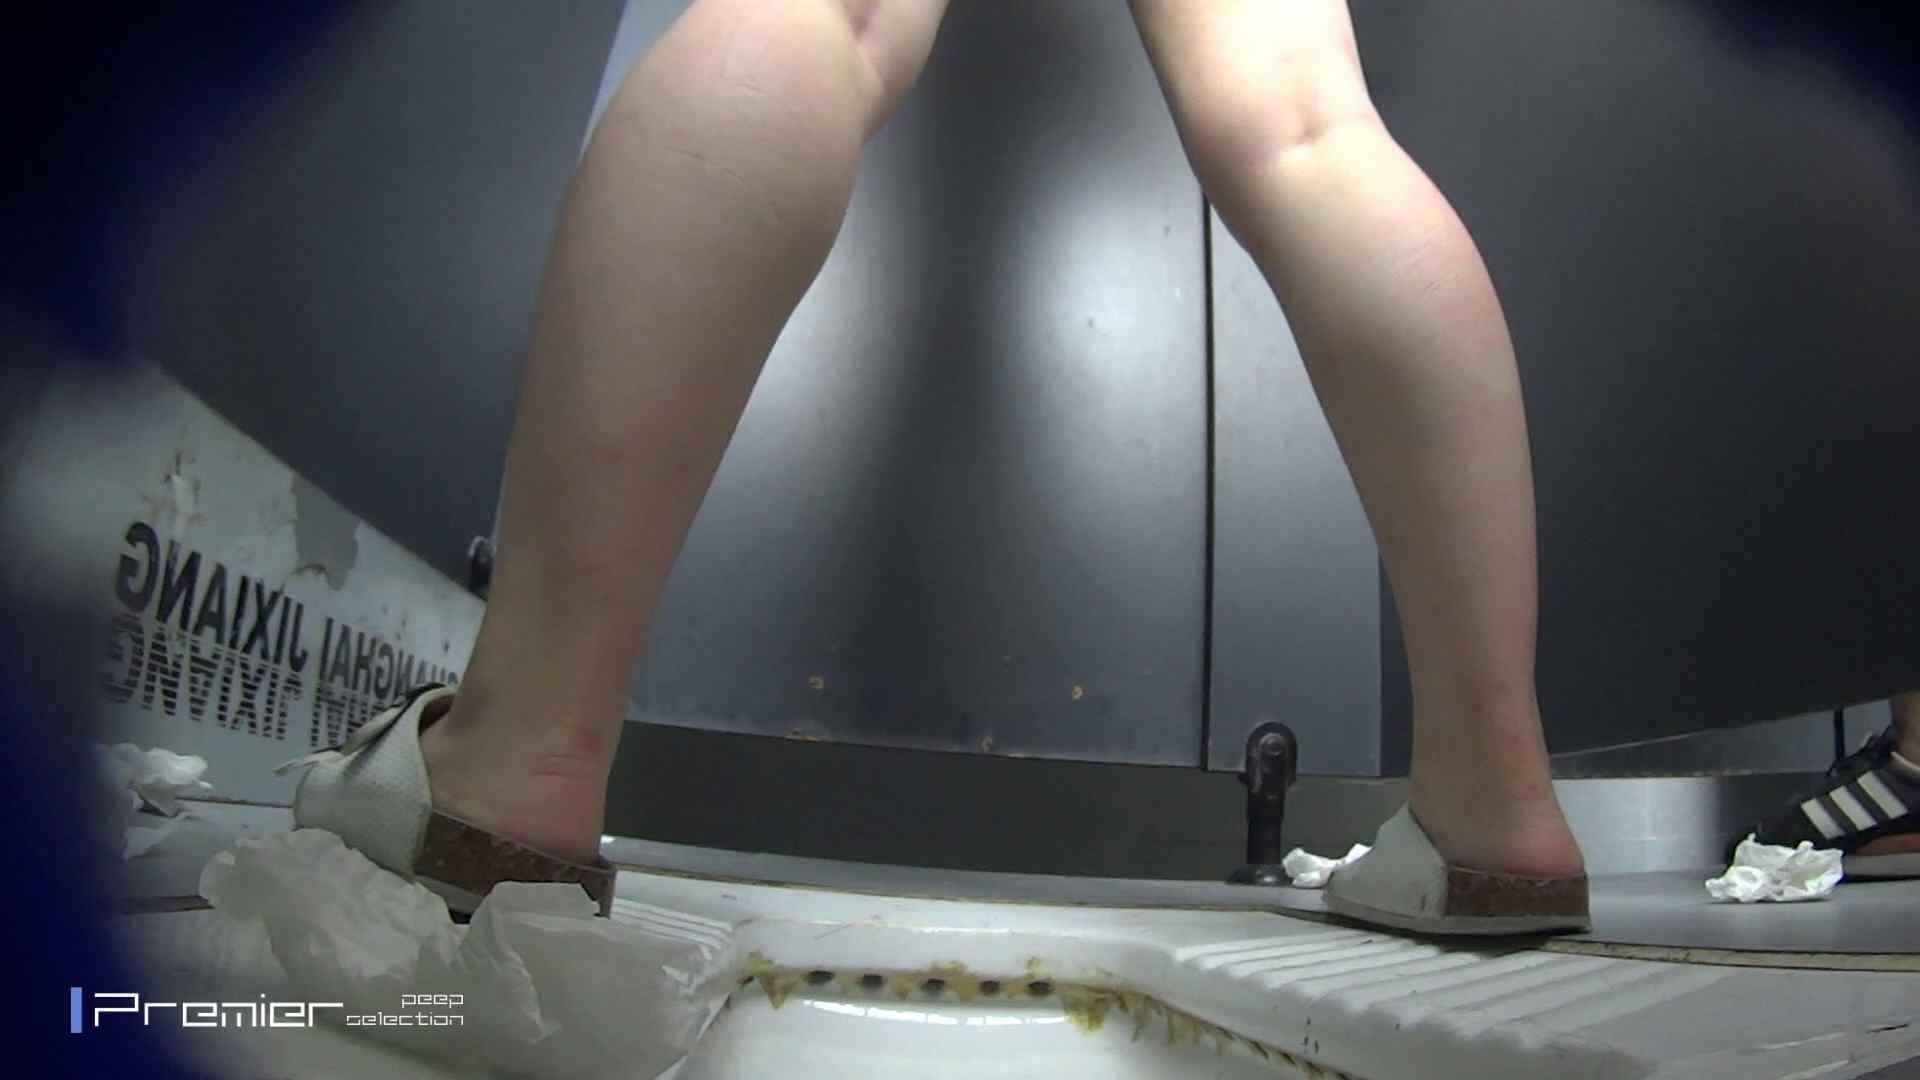 聖水ダラダラ色美女の洗面所 大学休憩時間の洗面所事情55 洗面所  55PIX 14